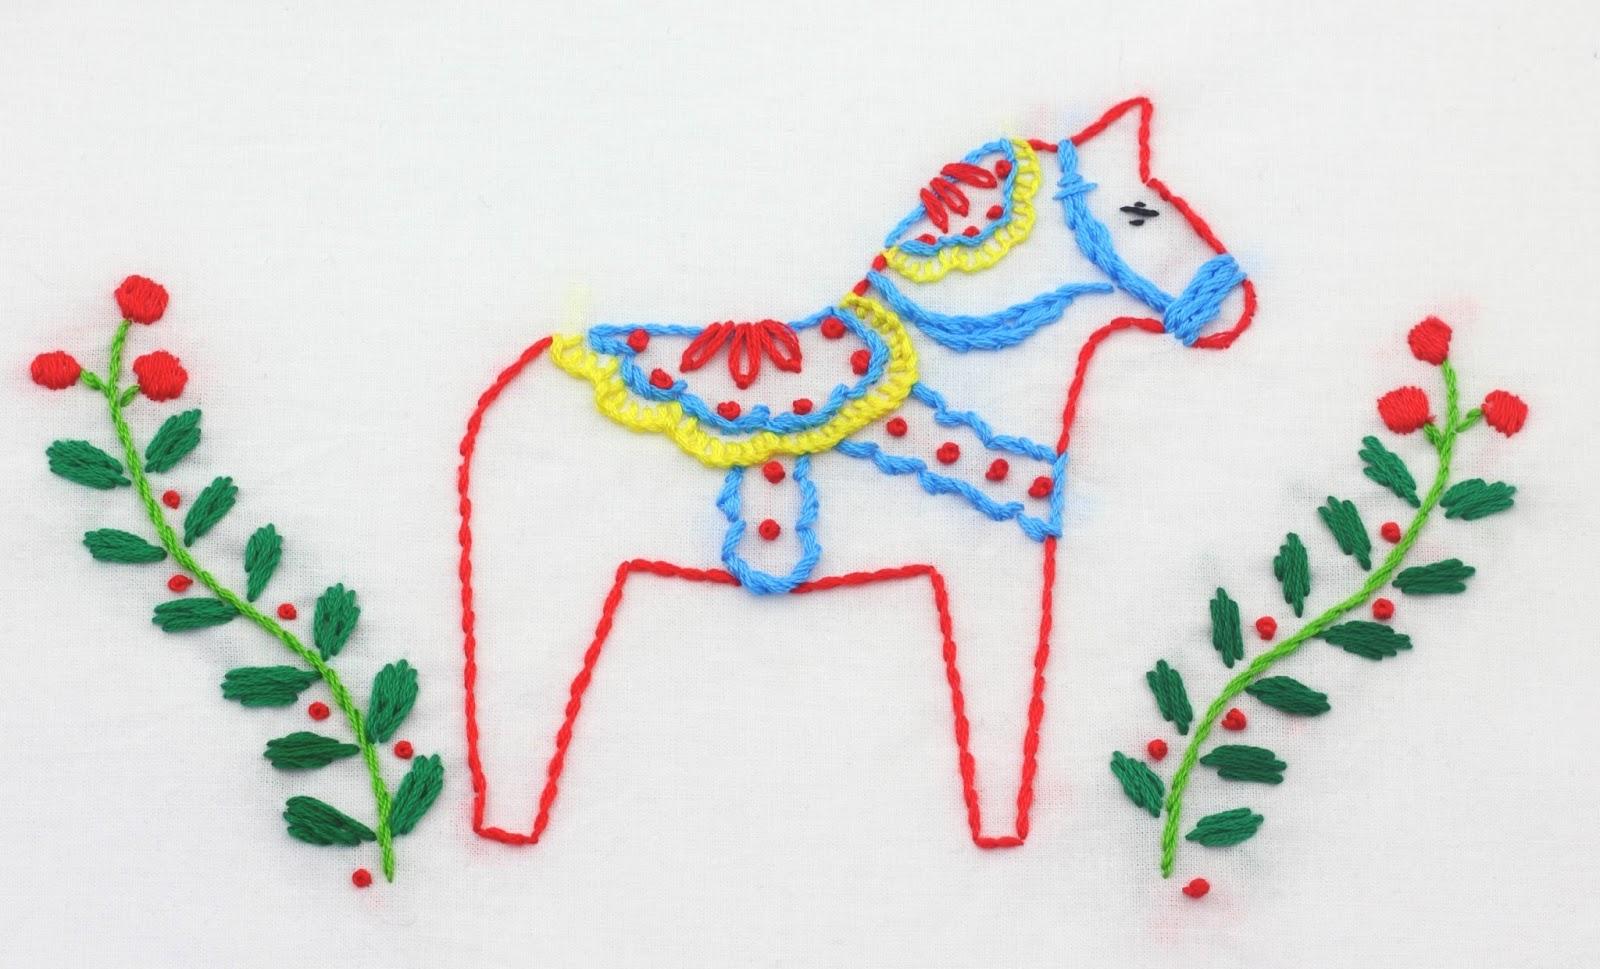 Big b dala horse embroidery